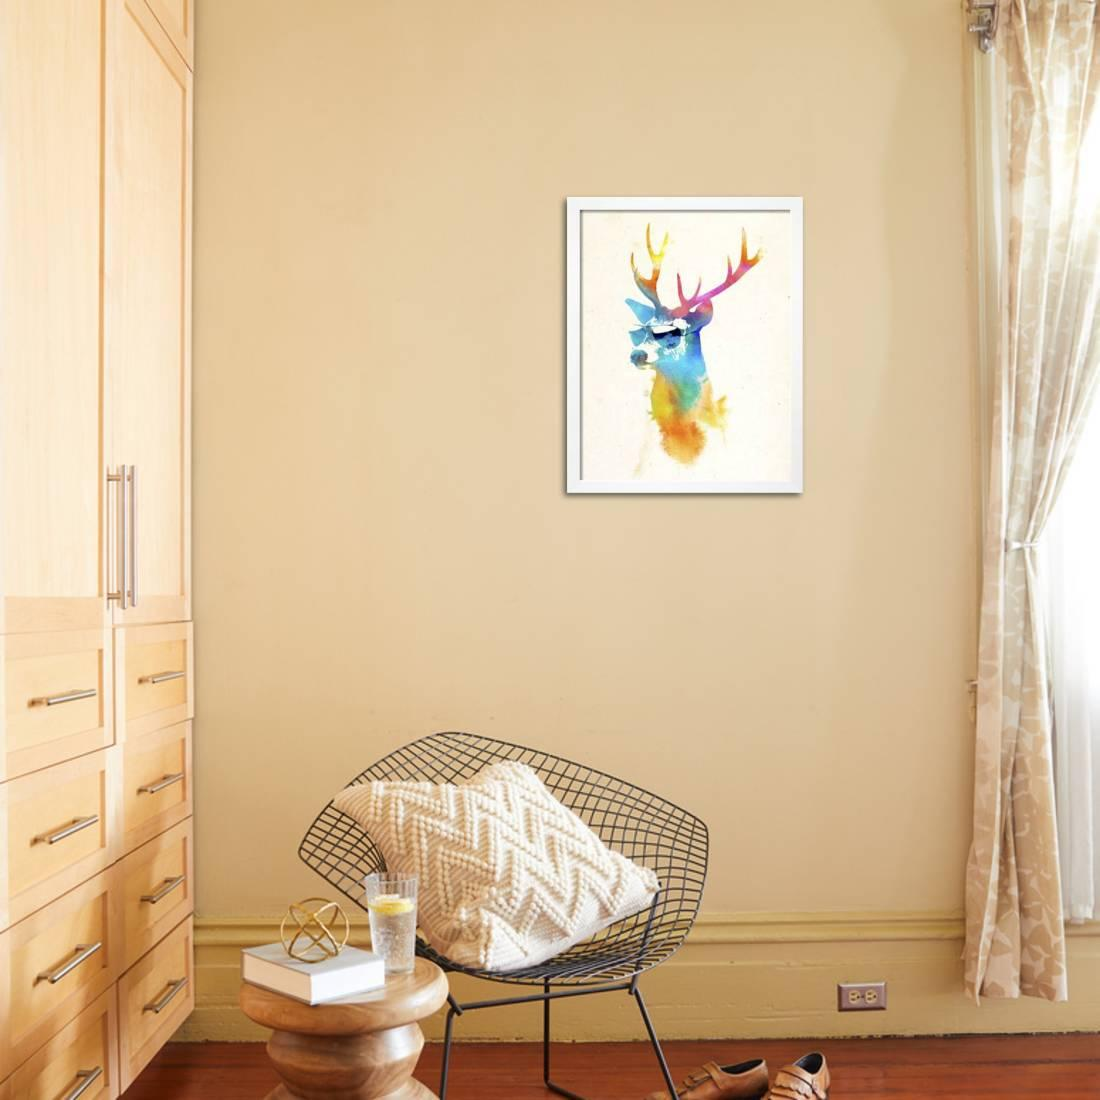 Sunny Stag Framed Print Wall Art By Robert Farkas - Walmart.com